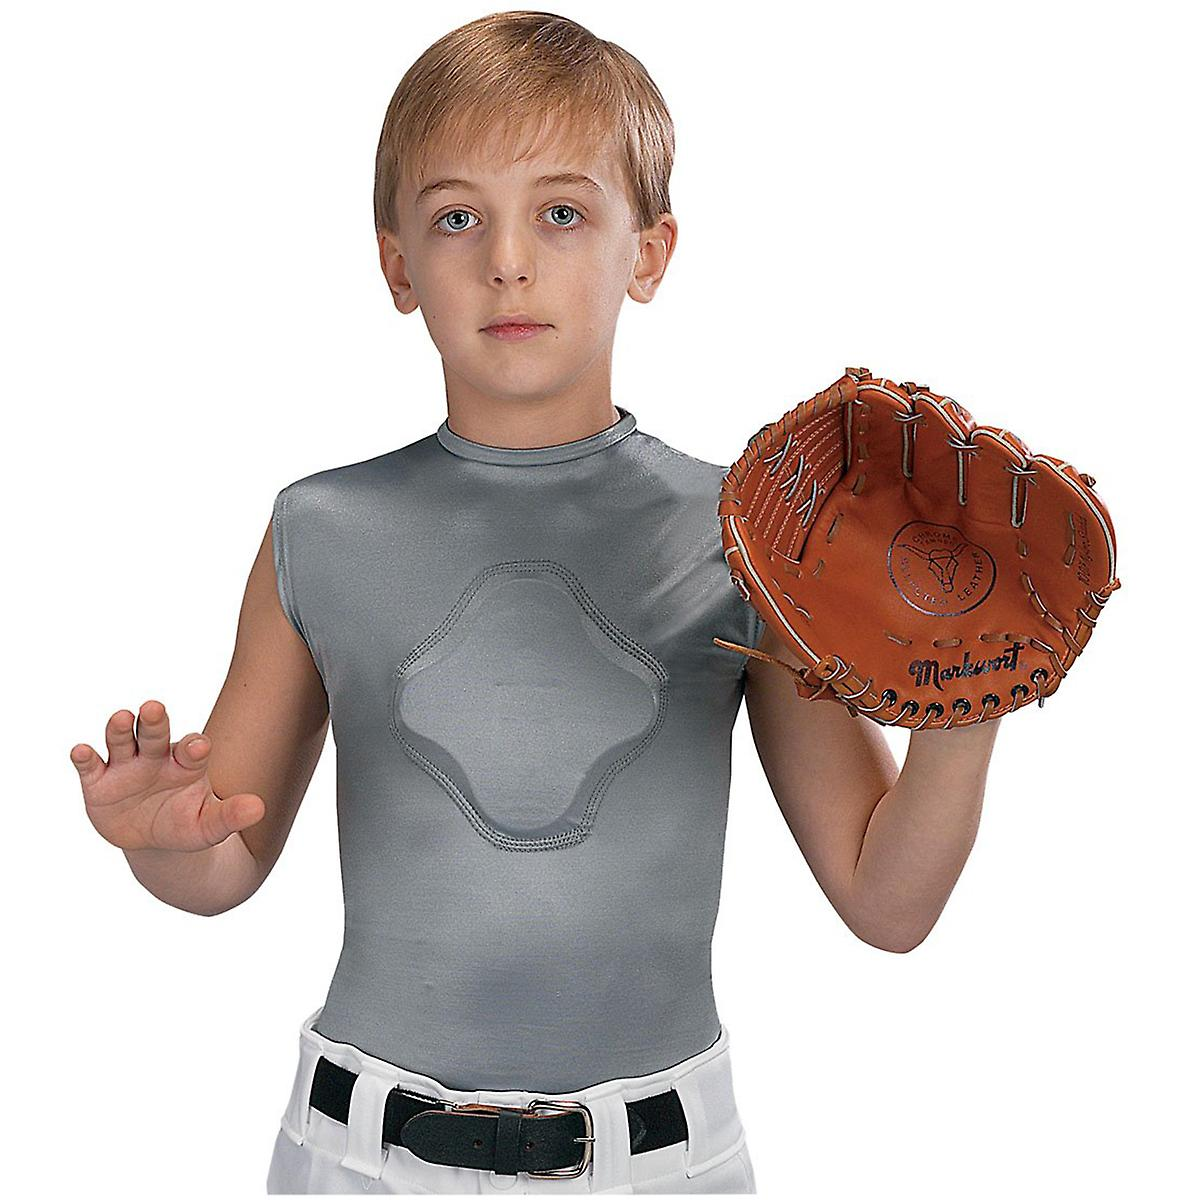 Markwort ungdom hjertet-Gard beskyttende komprimering kroppen skjorten - grå